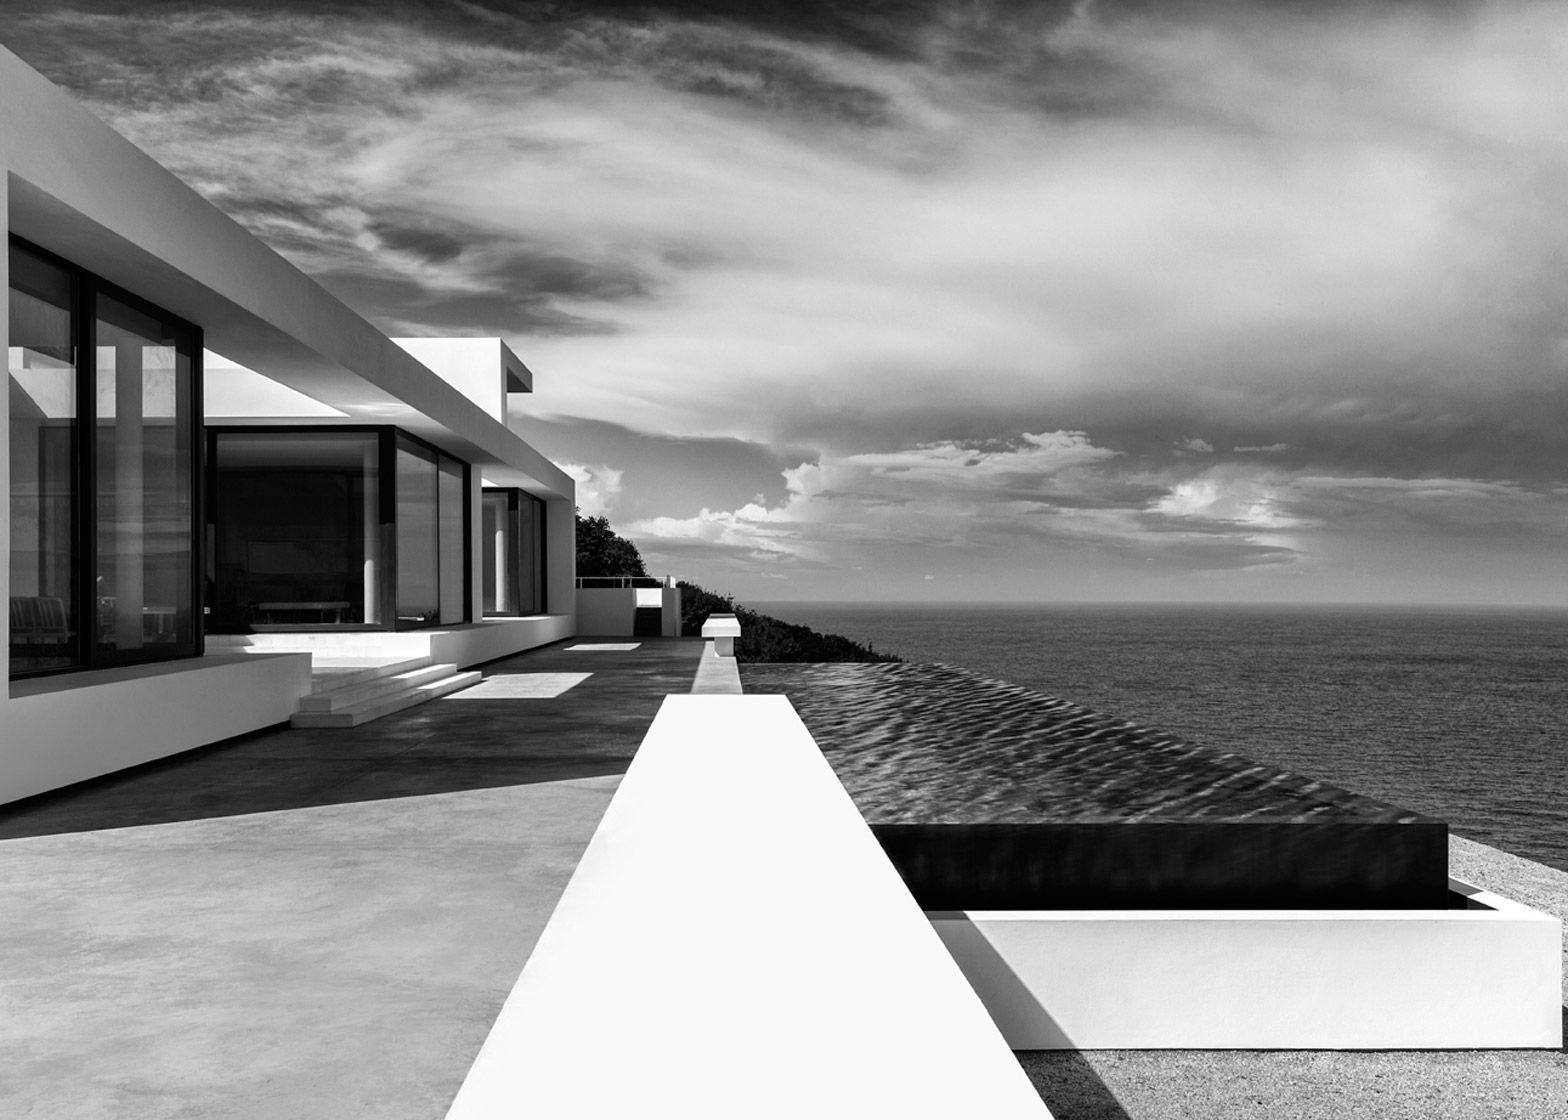 Olivier Dwek uses white walls to frame Ionian Sea views